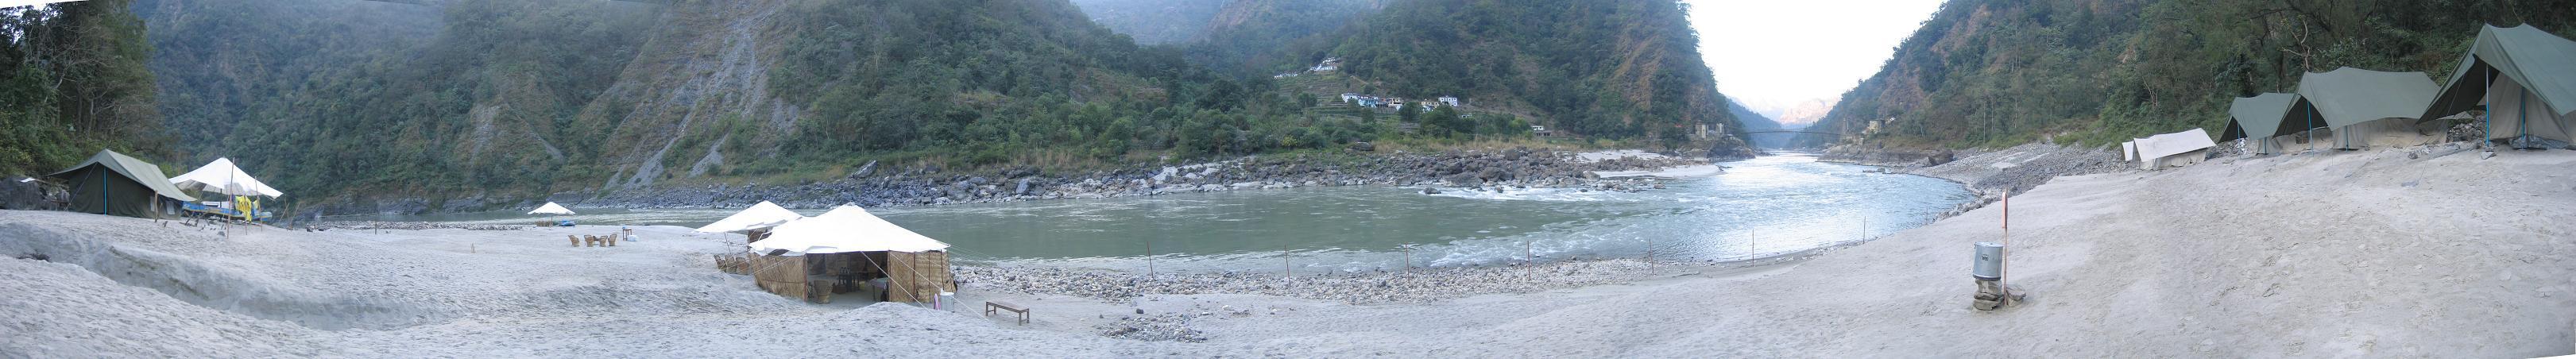 India_riverrafting1